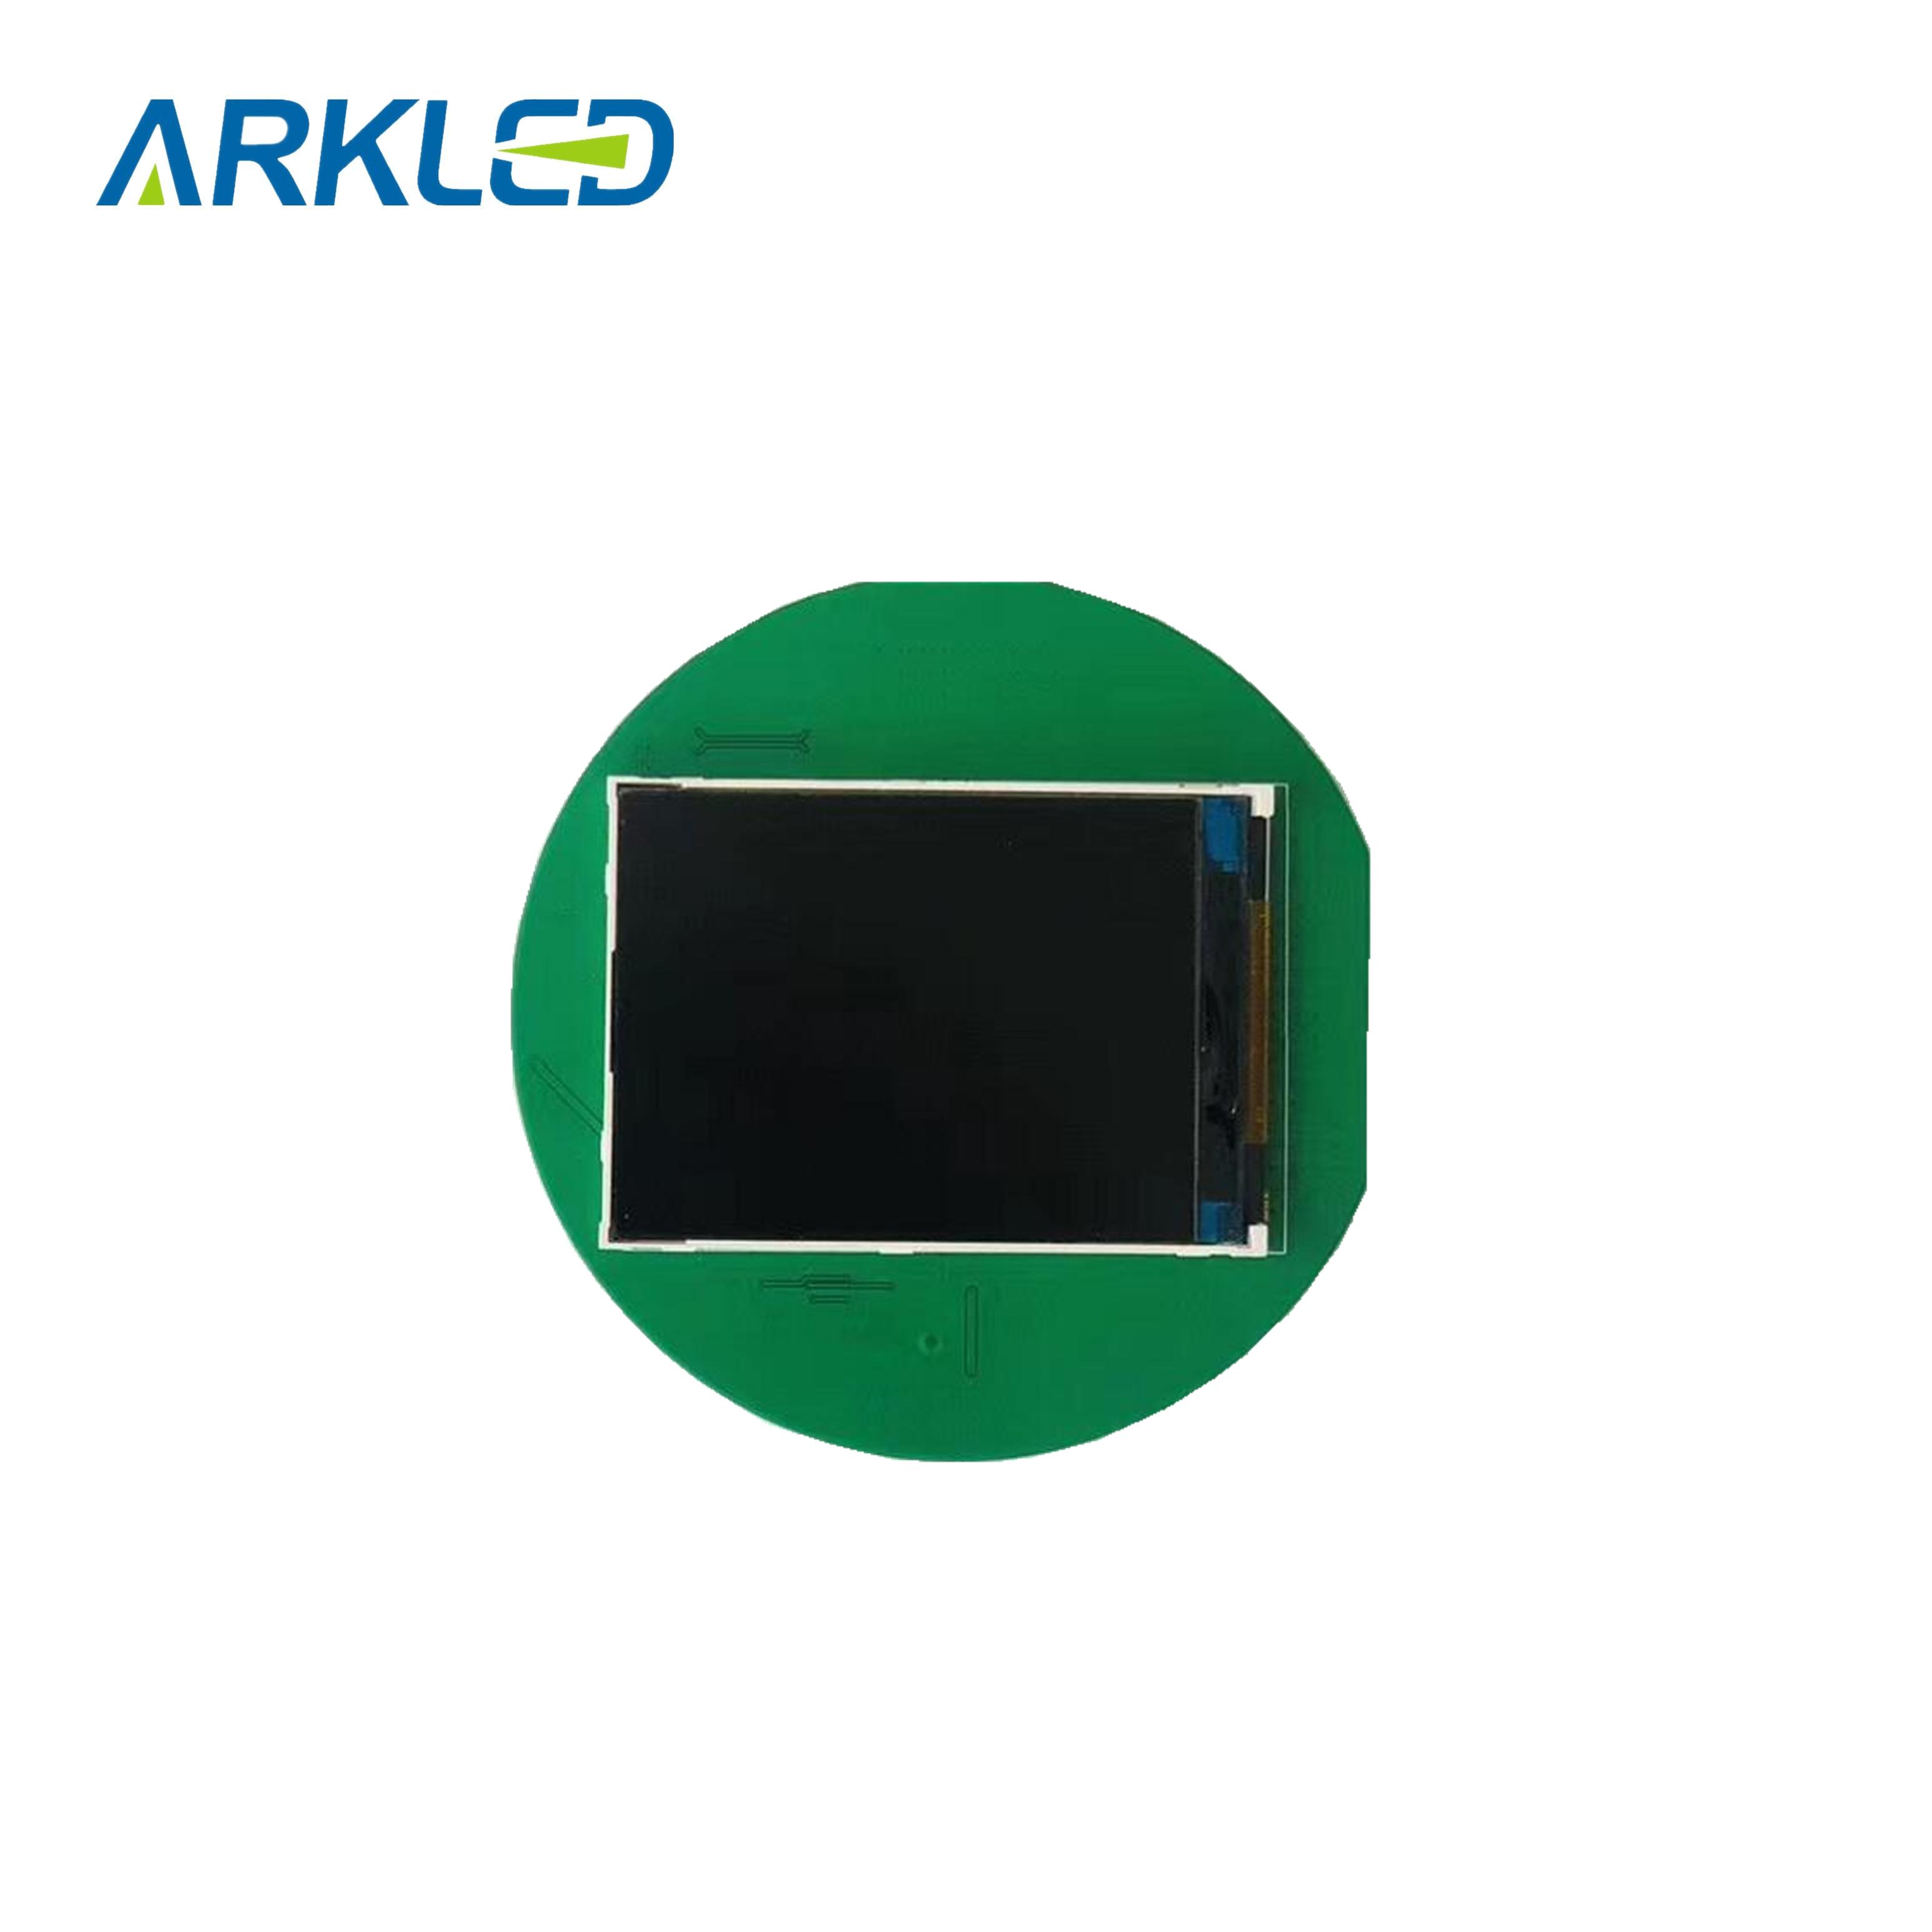 TFT-LCD薄膜晶體管液晶顯示器